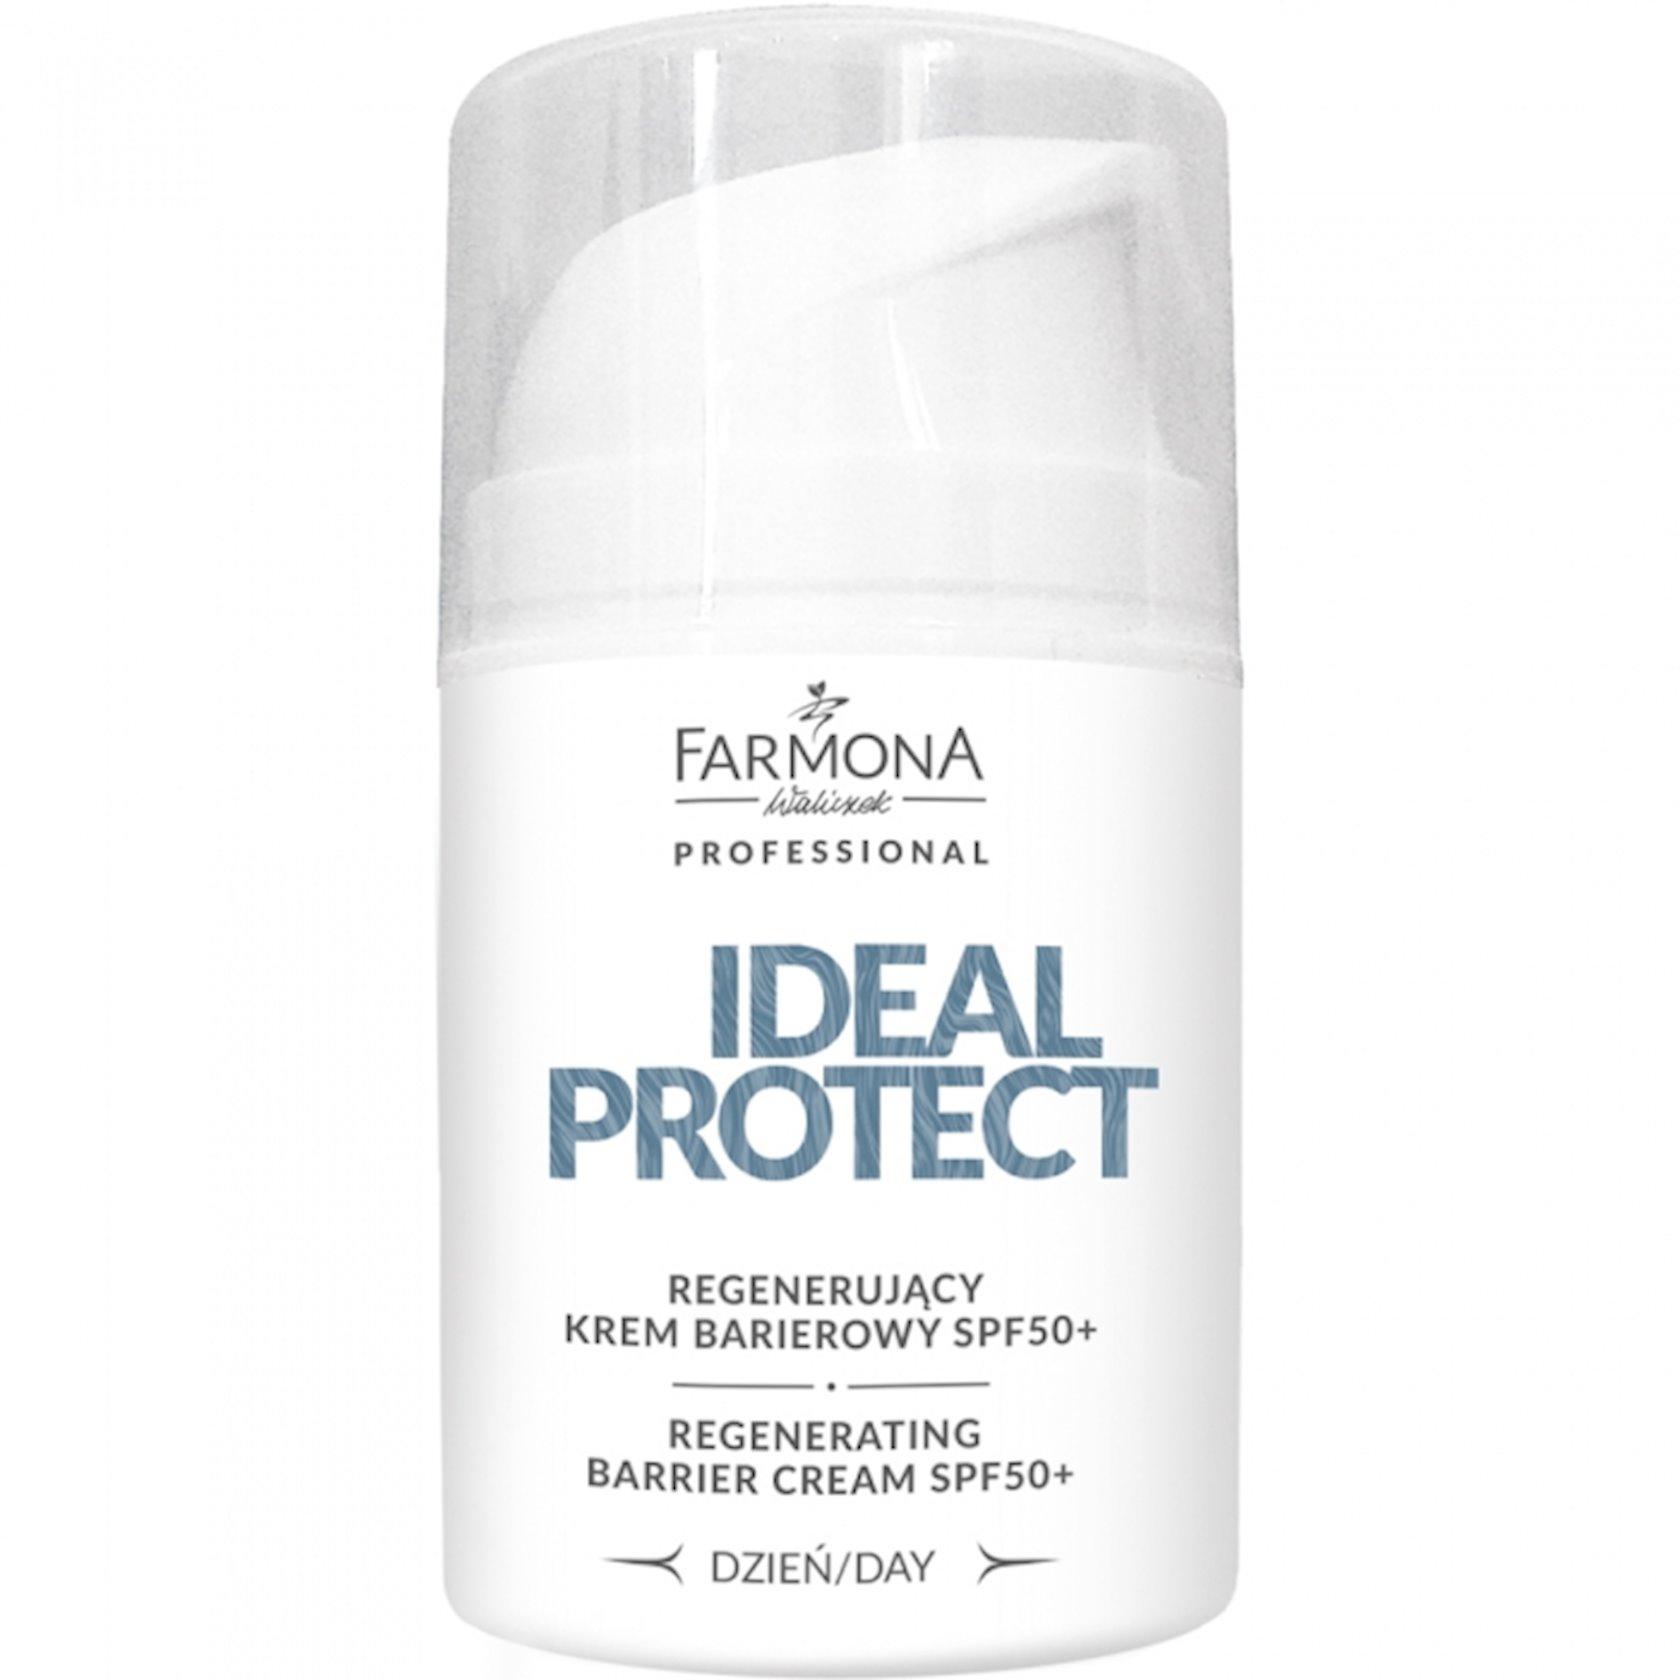 Gündüz üz kremi Farmona Professional Ideal Protect Regenerating Day Cream SPF50+ 50 ml